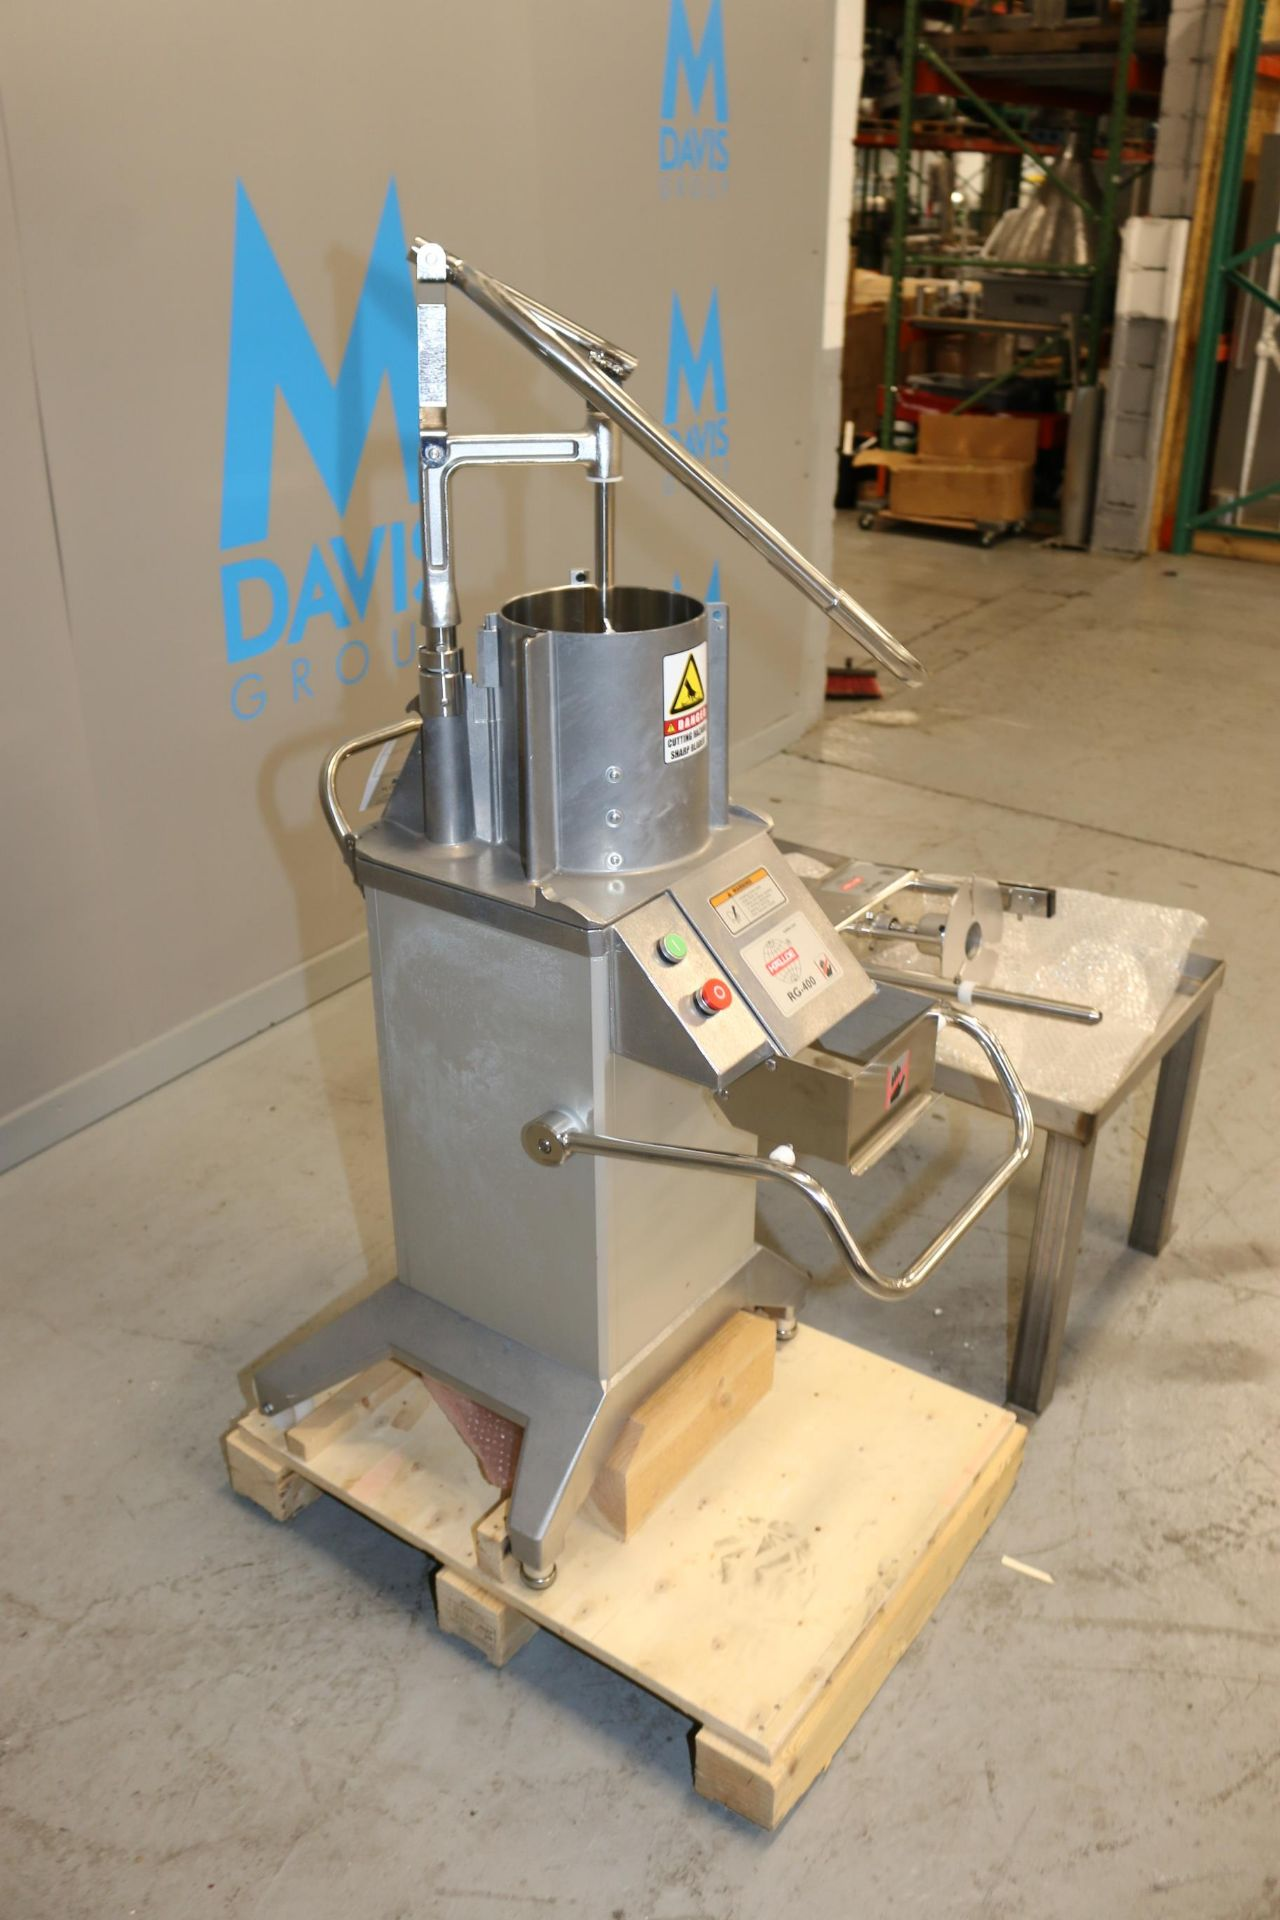 Lot 39 - Hallde S/S Vegetable Preparation Machine, M/N RG-400, S/N 1233599, 208-240 Volts, 0.9/1.6 hp